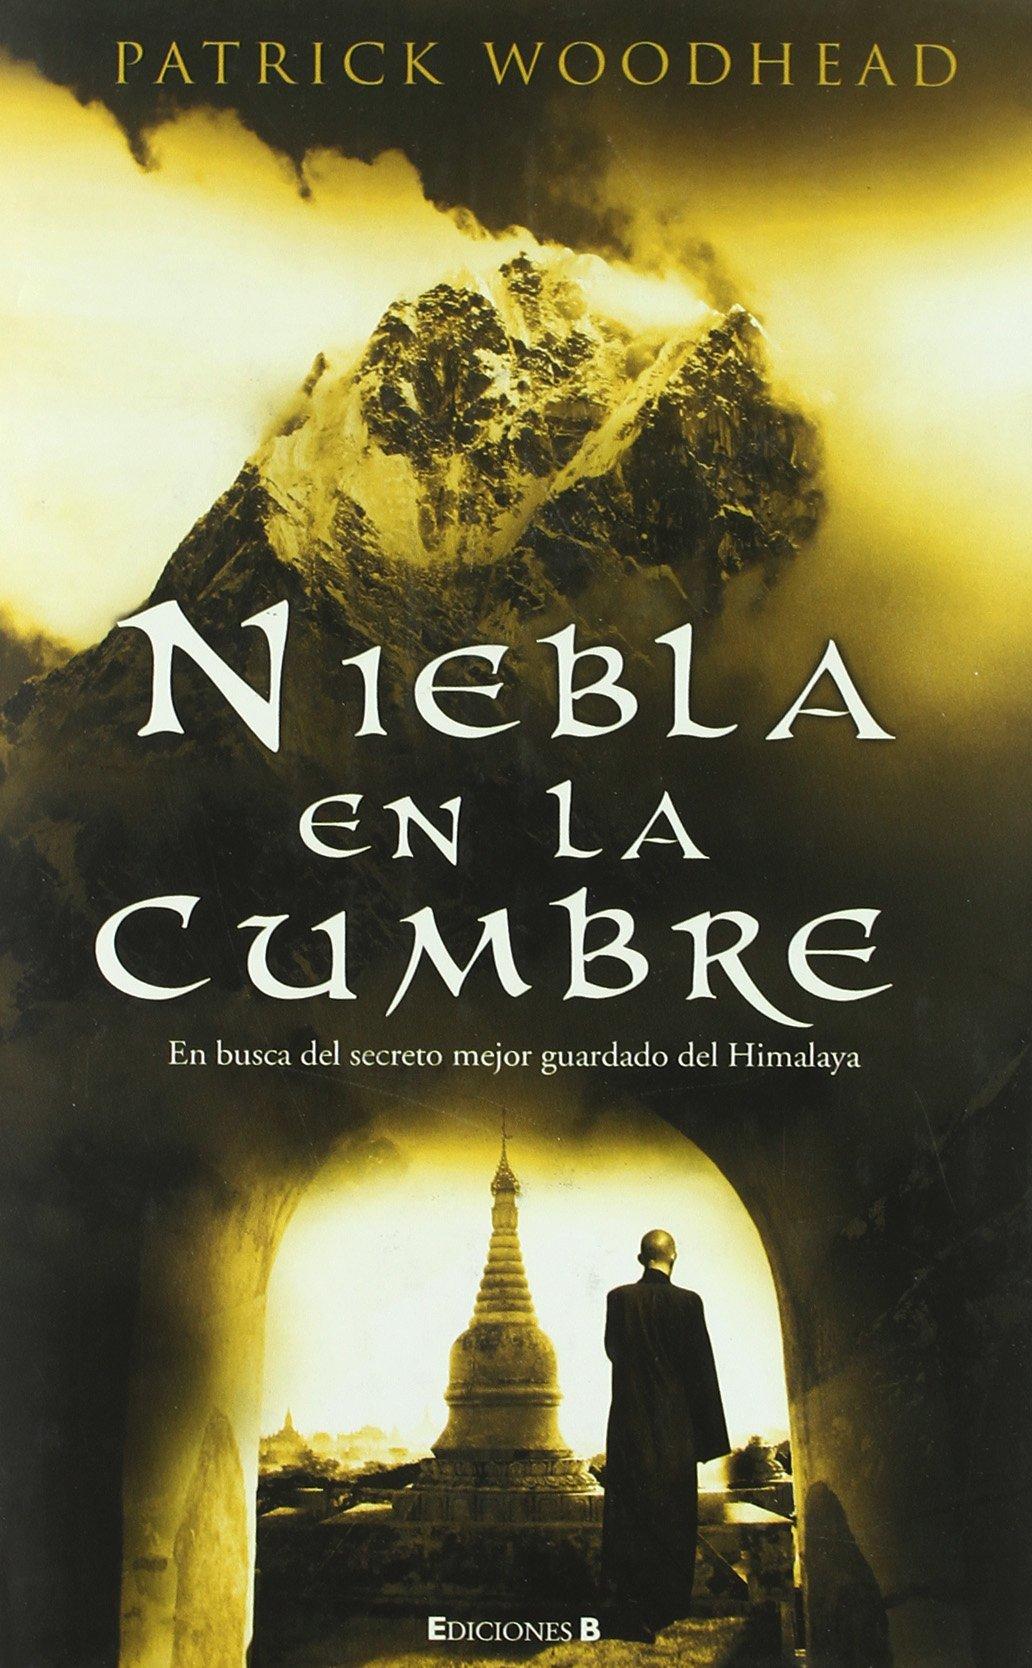 Amazon.com: NIEBLA EN LA CUMBRE (Grandes Novelas) (Spanish Edition) (9788466643320): PATRICK WOODHEAD: Books